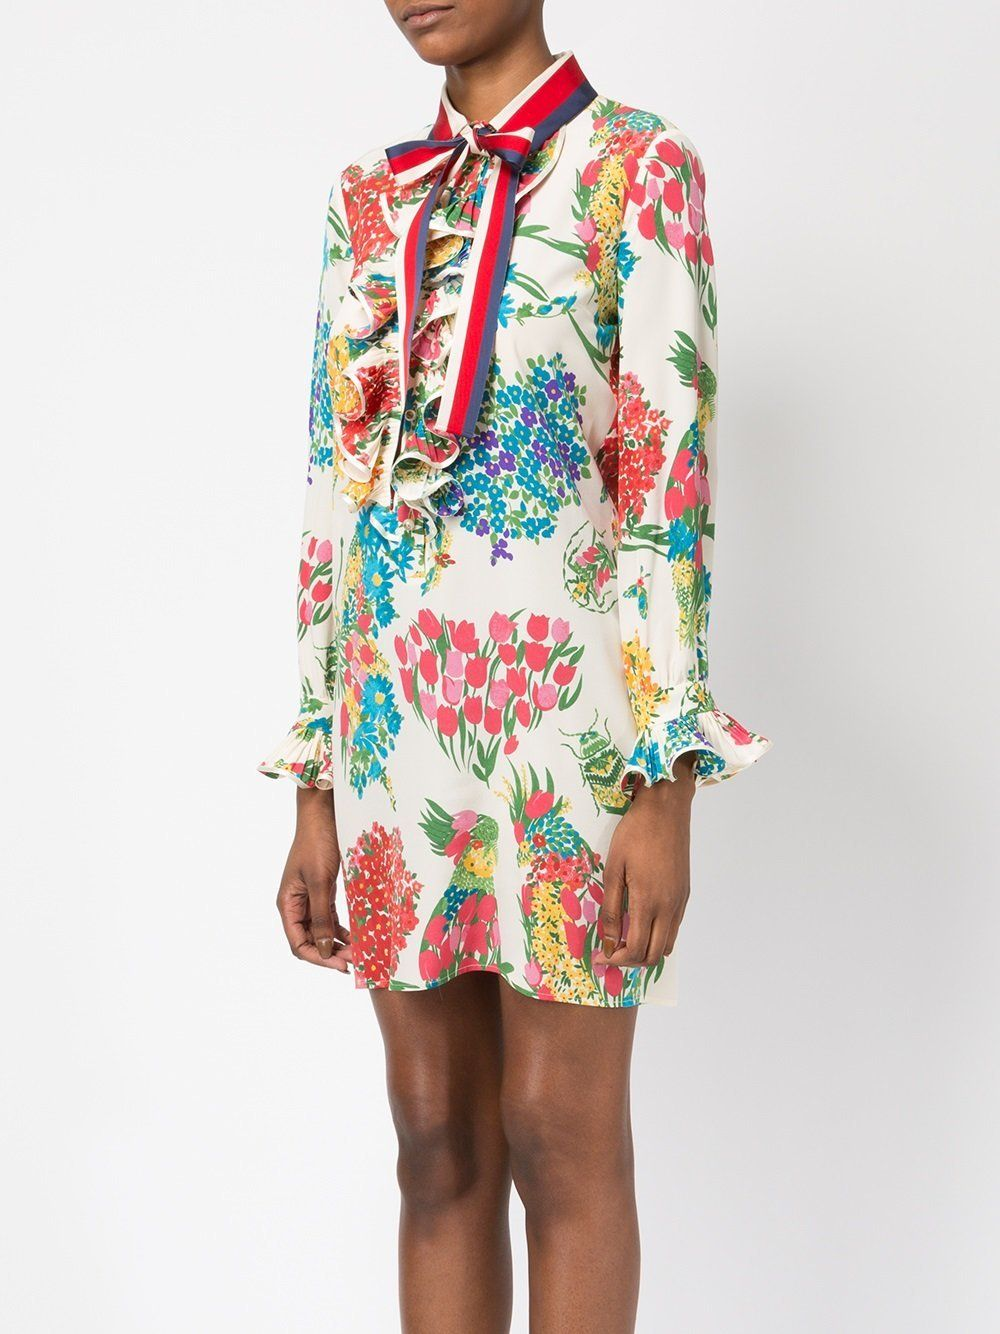 85cb1e372 Gucci Floral Print Ruffle Trim Shirt Dress in 2019 | GUCCI | Gucci ...